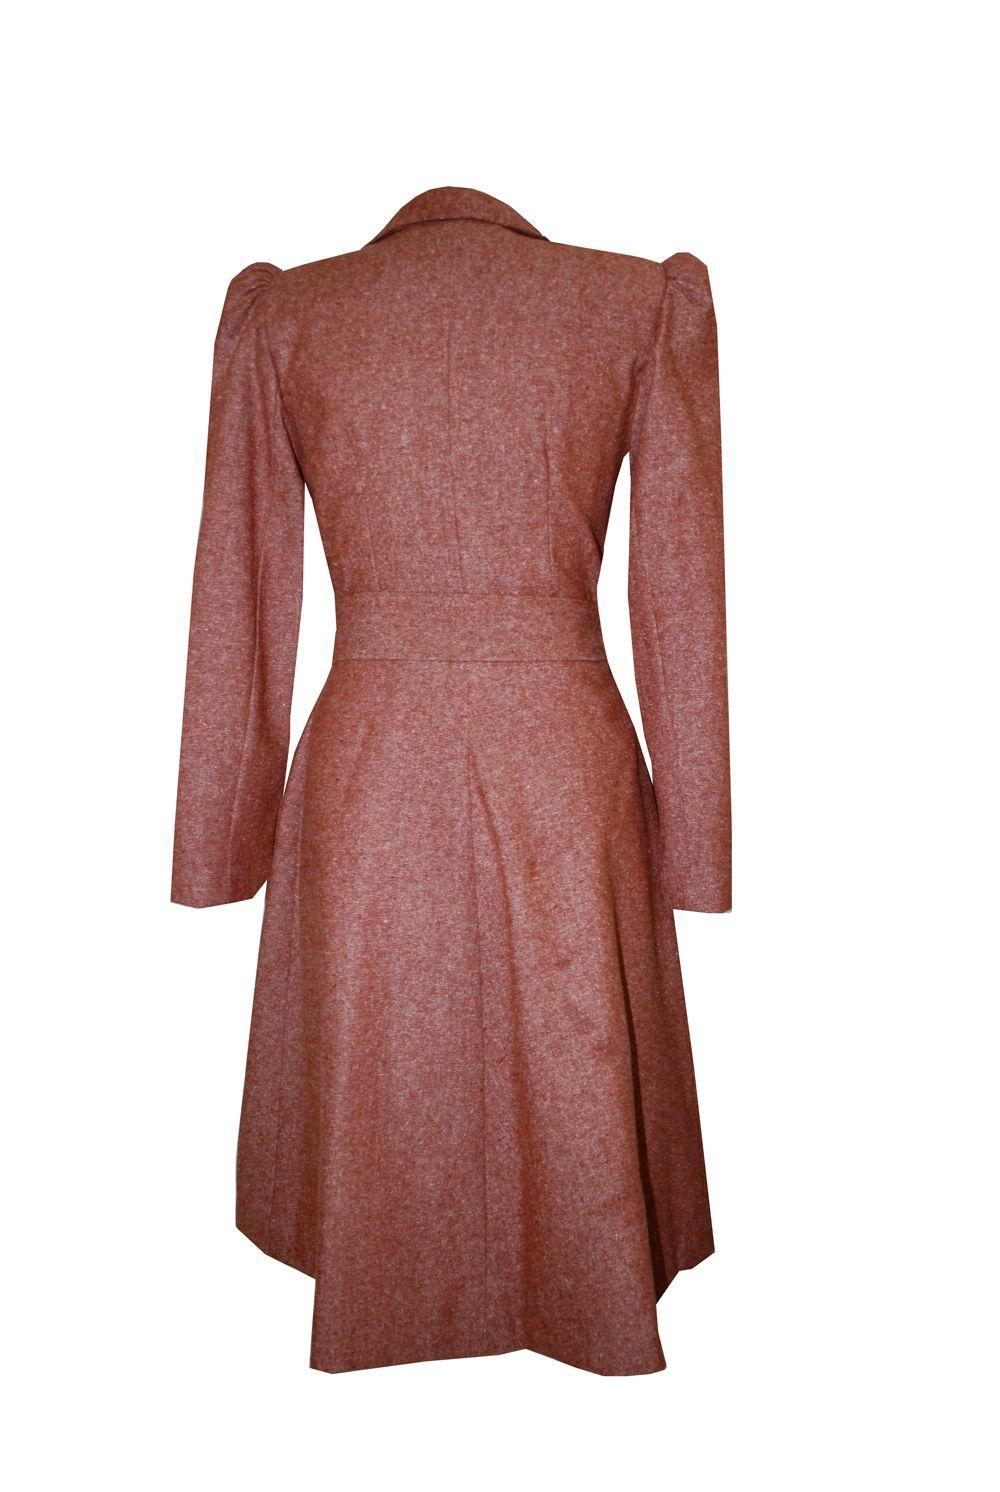 Tara Starlet 1940s 40s Style: Tara Starlet 40s Style Coat BACK